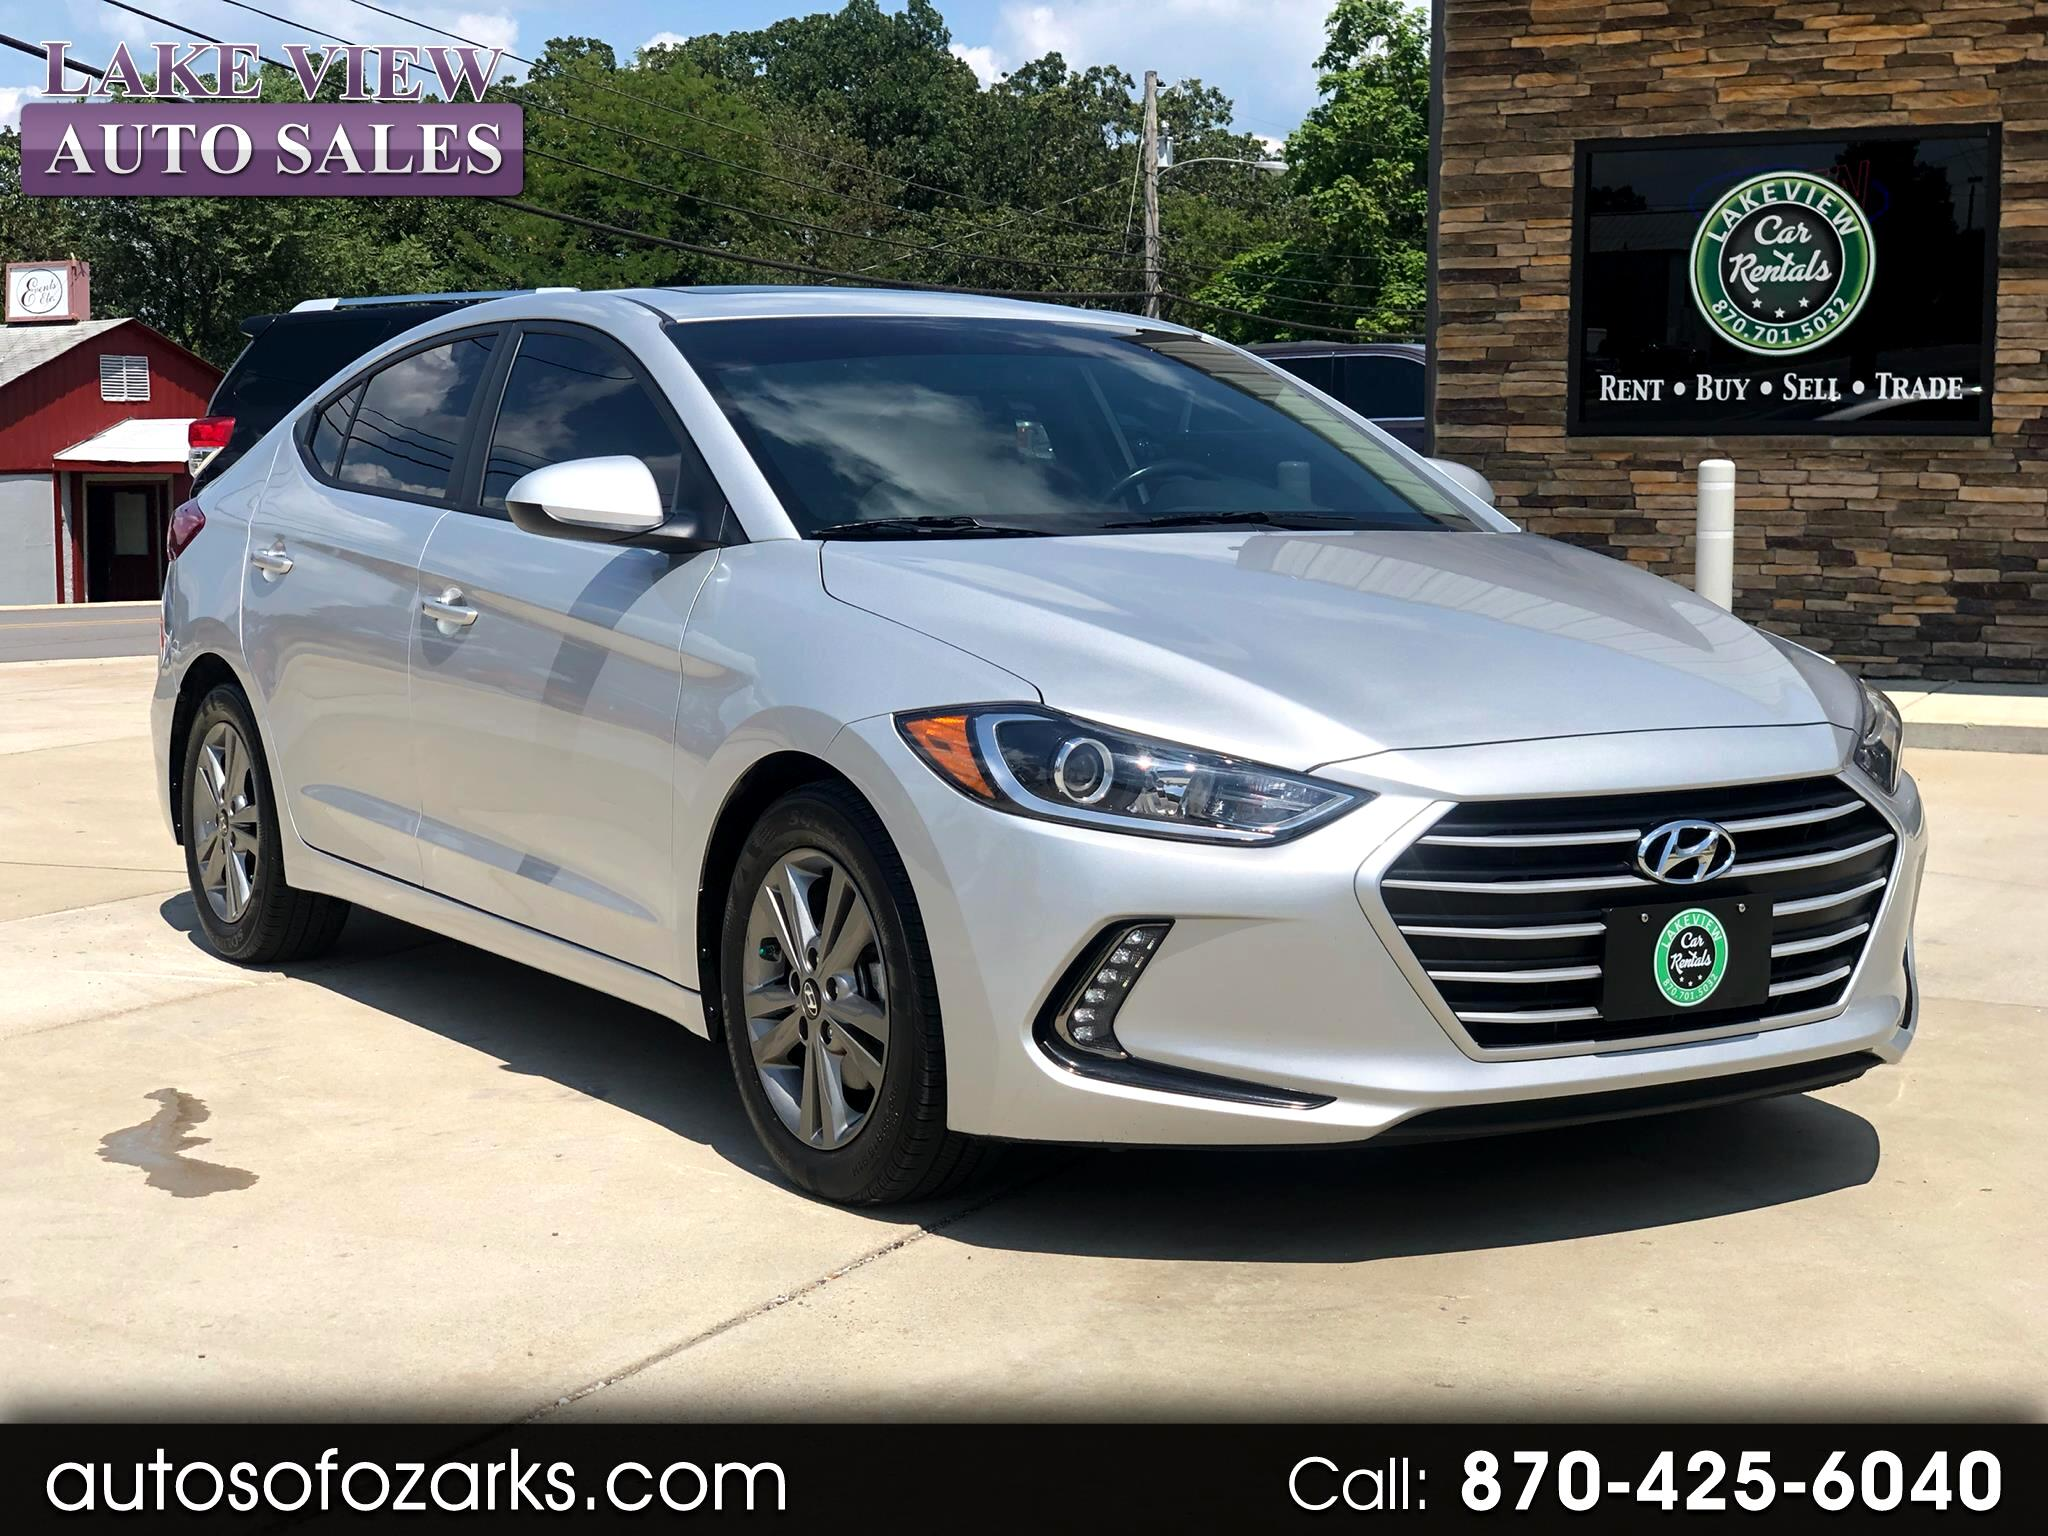 2018 Hyundai Elantra Value Edition 2.0L Auto (Alabama)